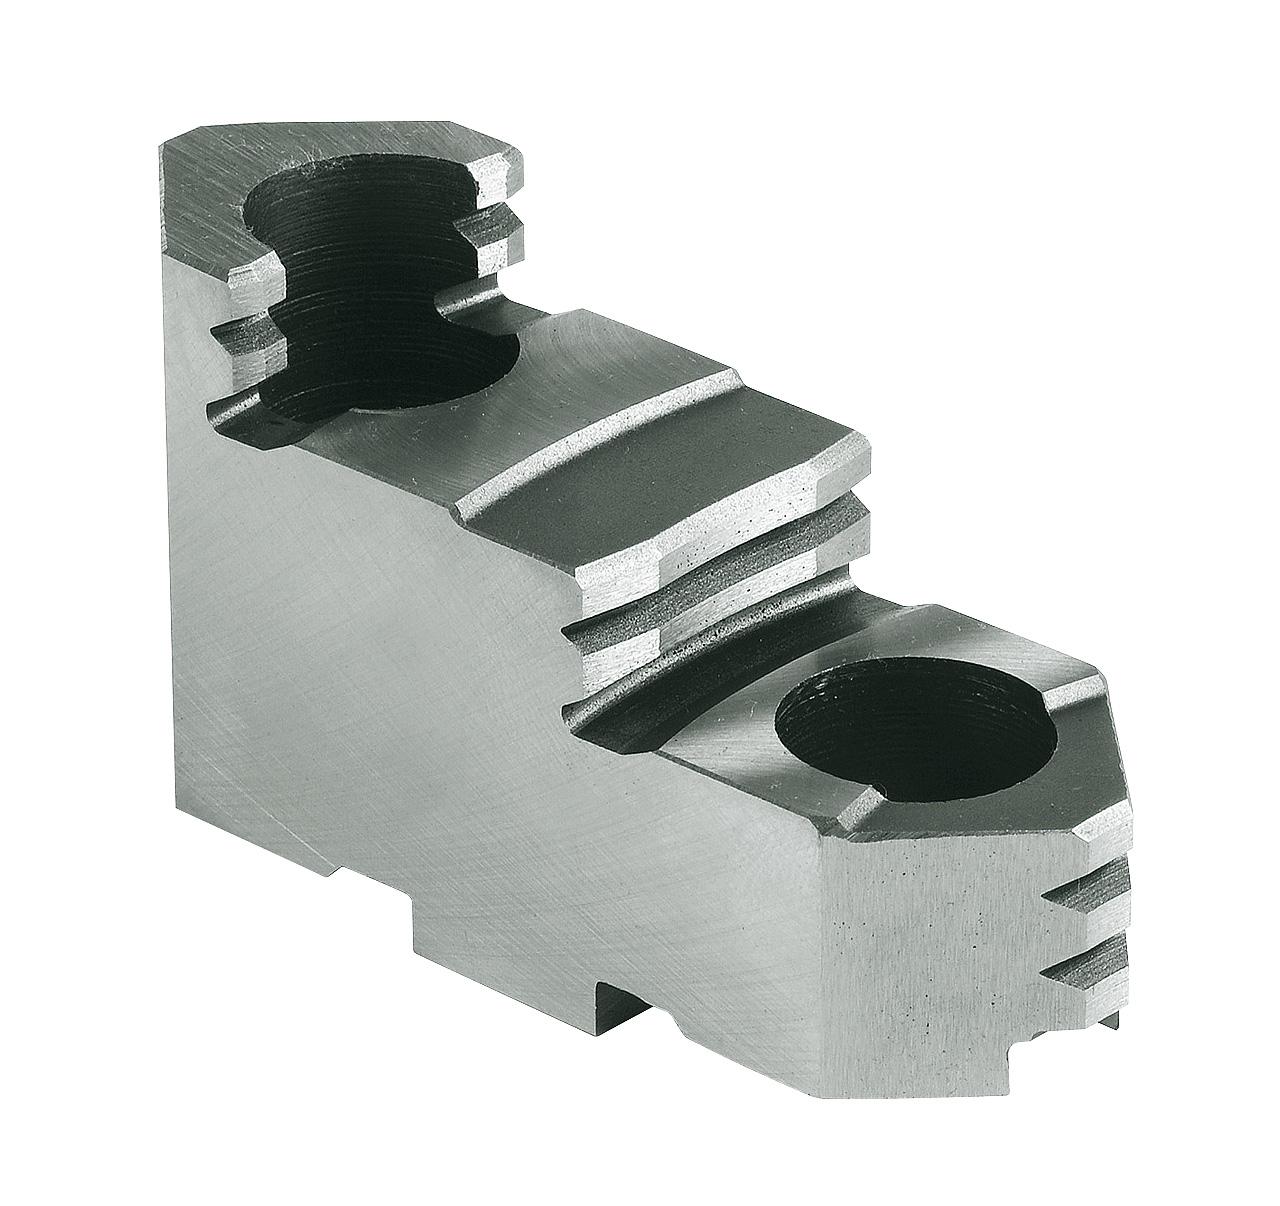 Szczęki górne twarde - komplet DTJ-DK12-630 BERNARDO